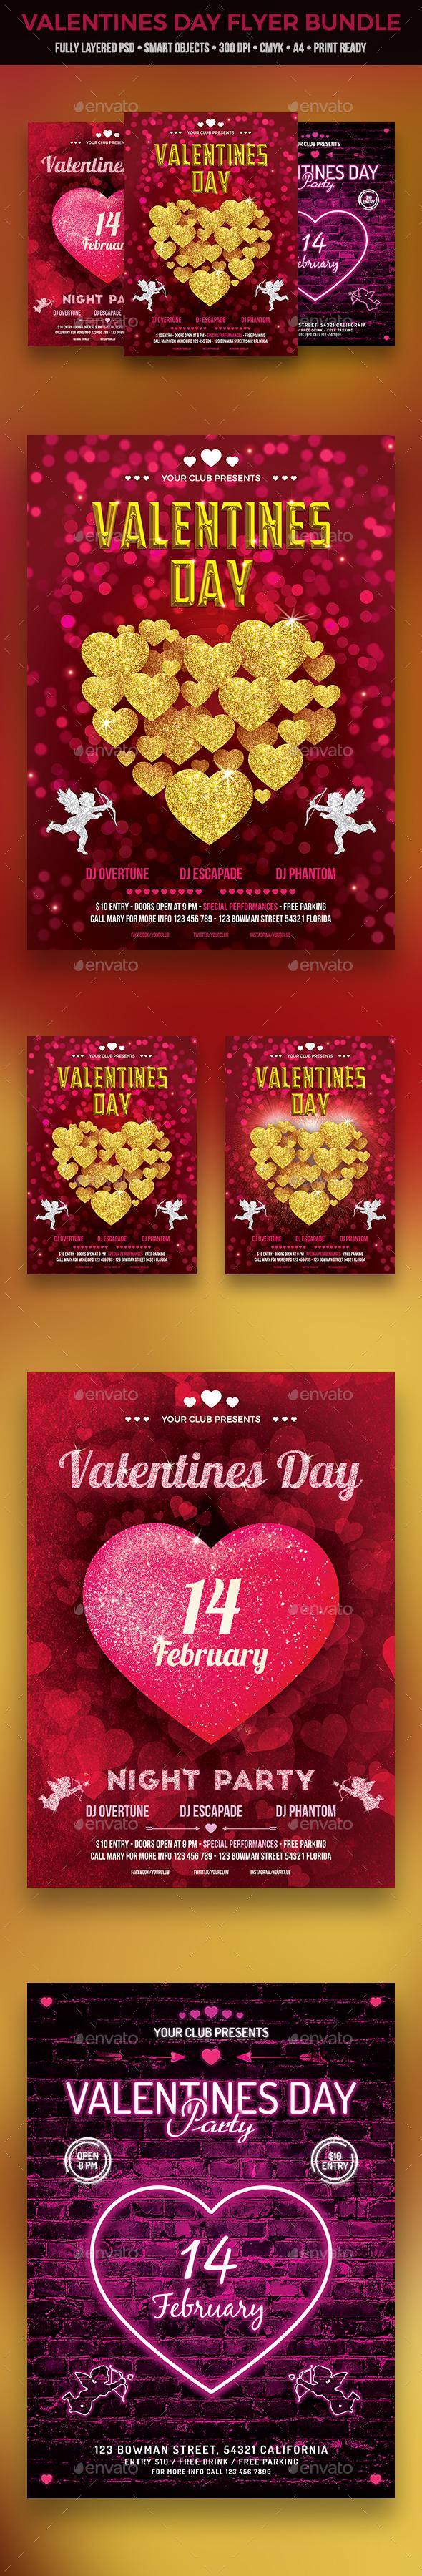 GraphicRiver Valentines Day Flyer Bundle 20973863